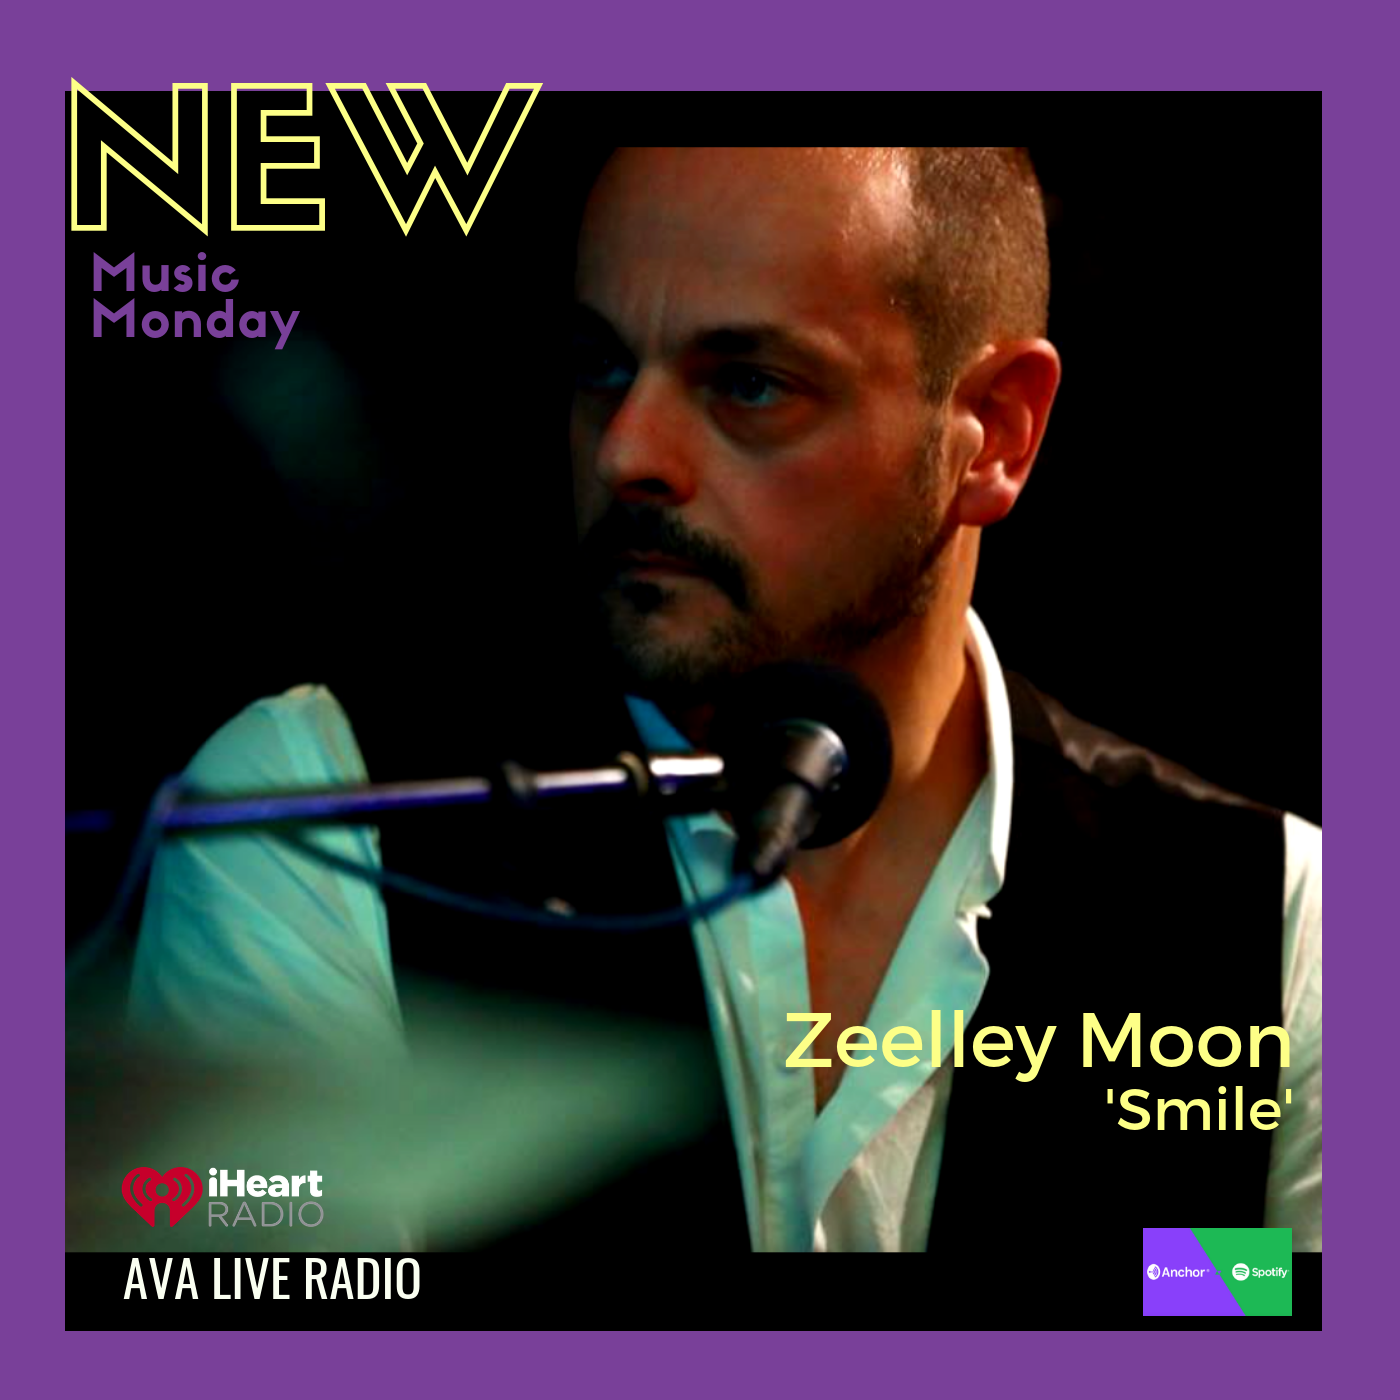 Zeelley Moon avaliveradio.png